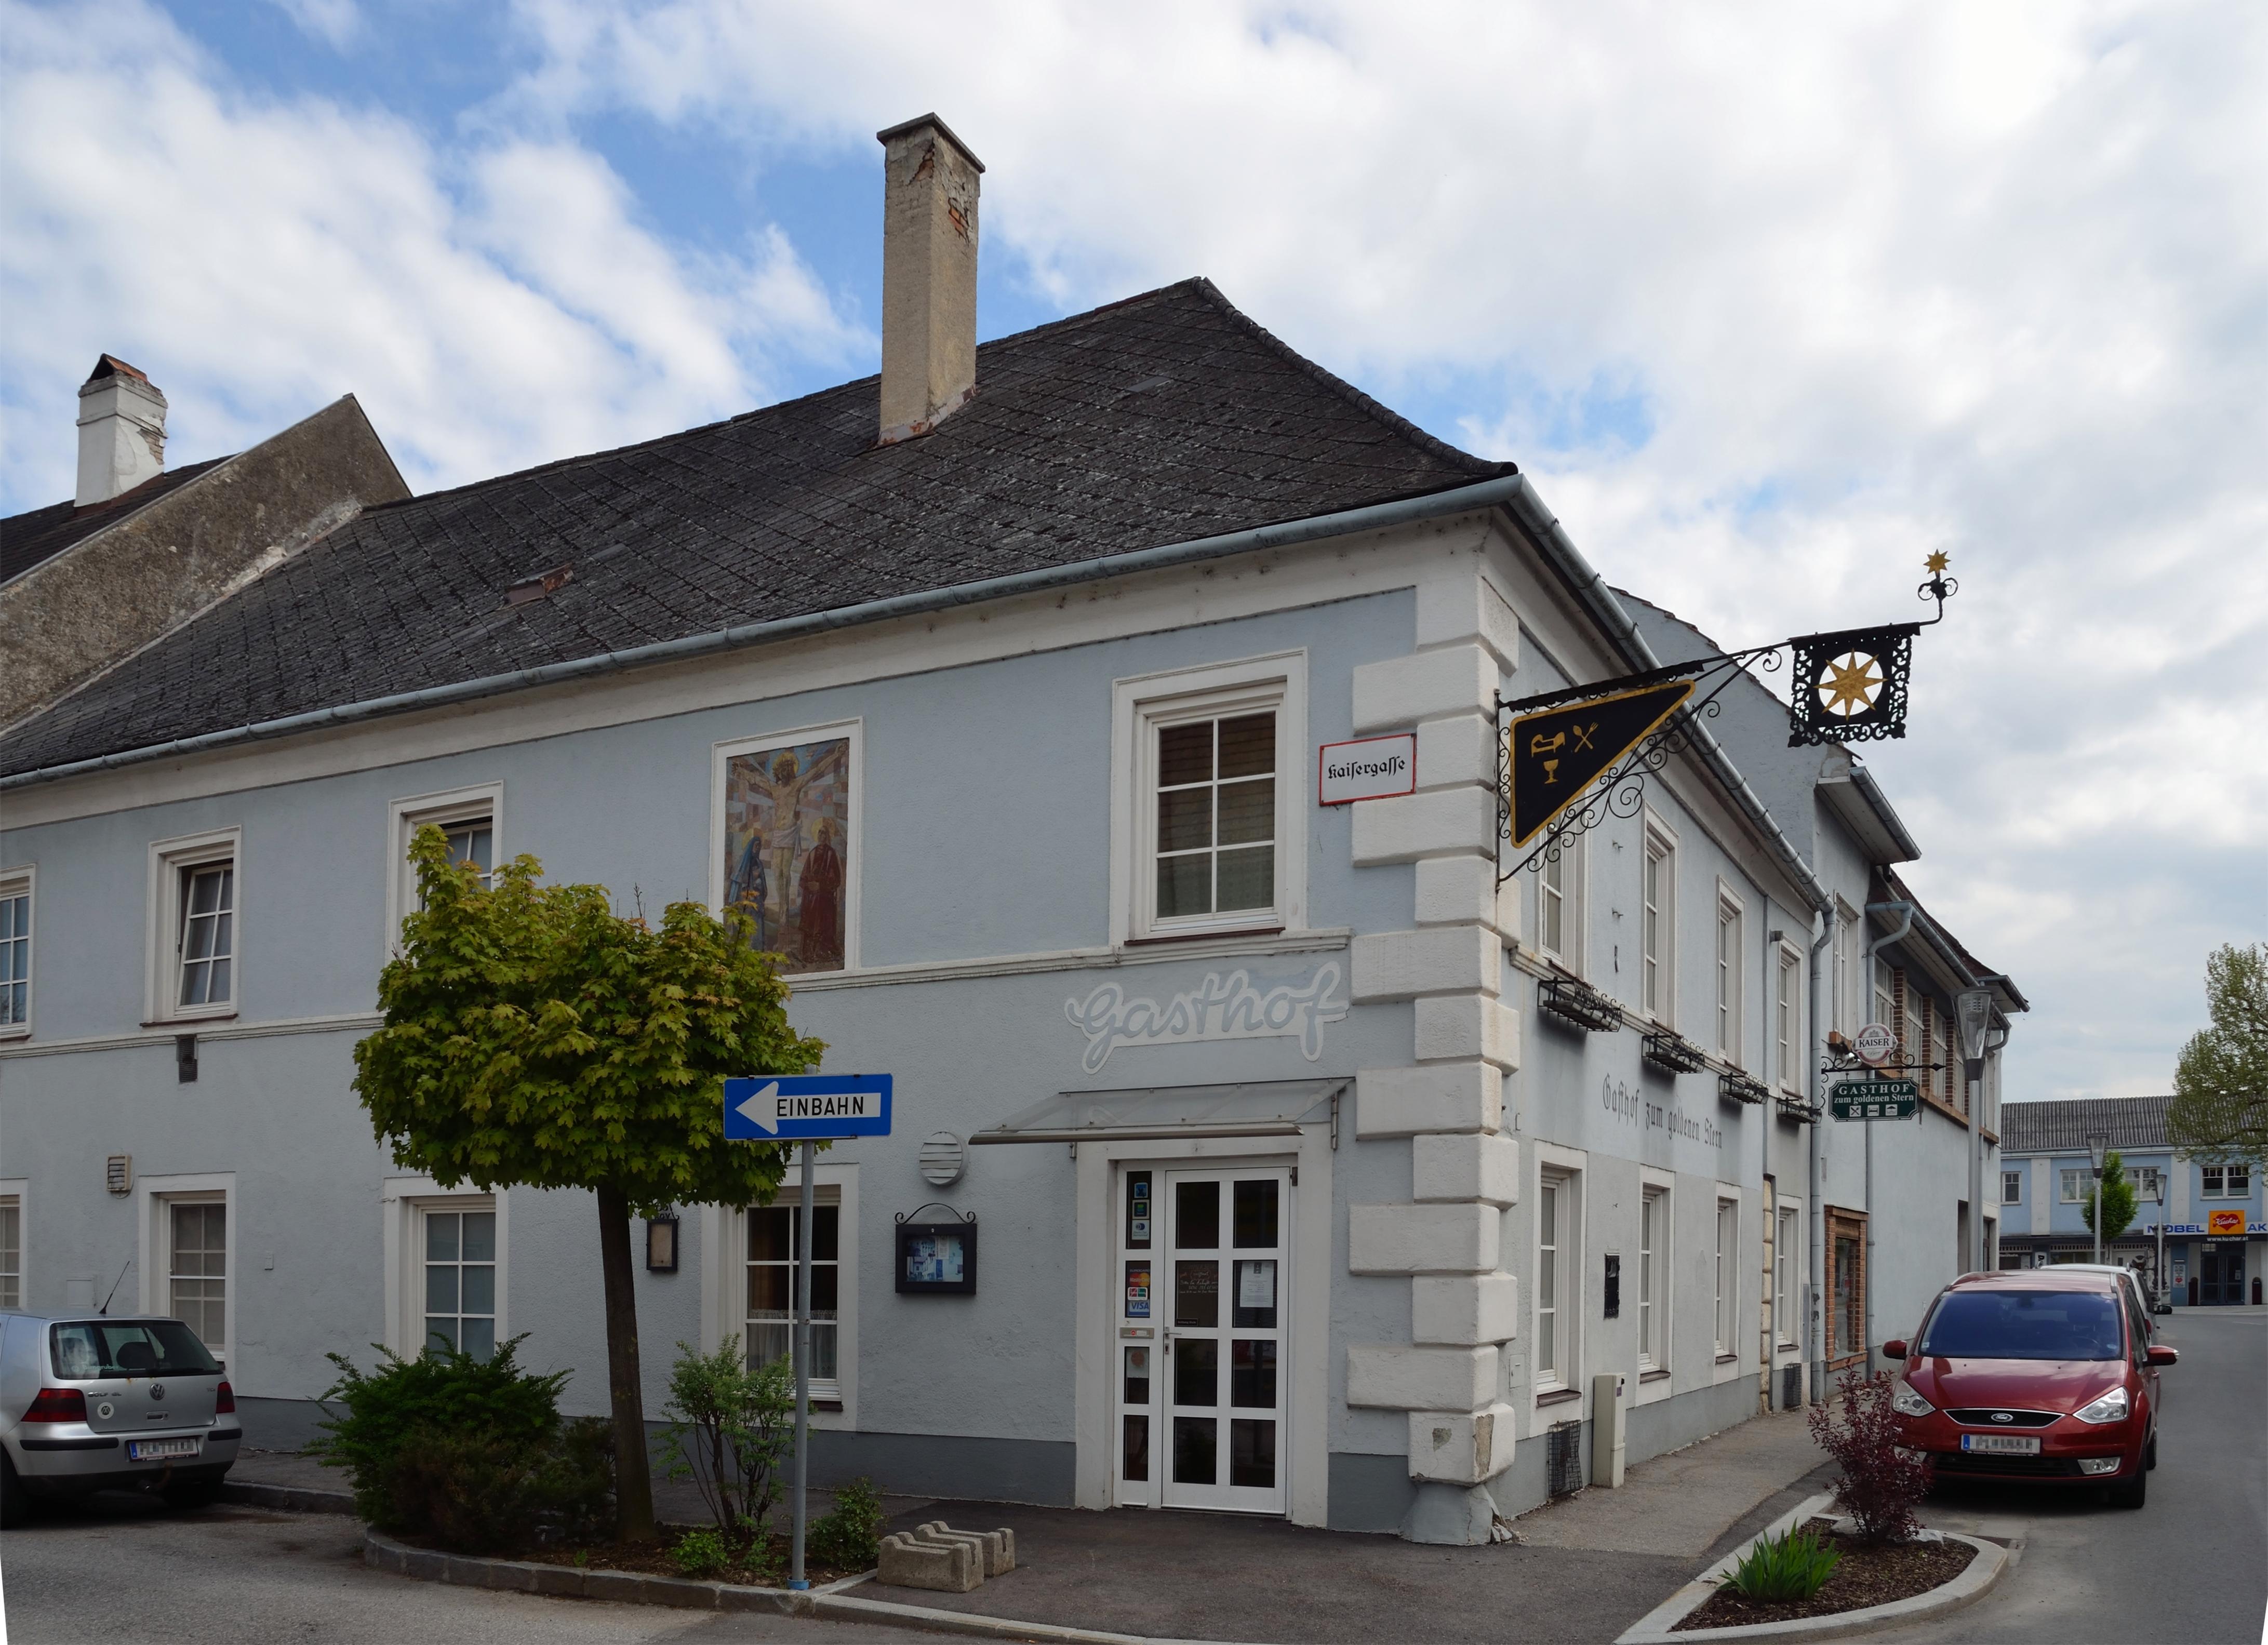 Hotel Zum Goldenen Stern Leibsch Bewertung